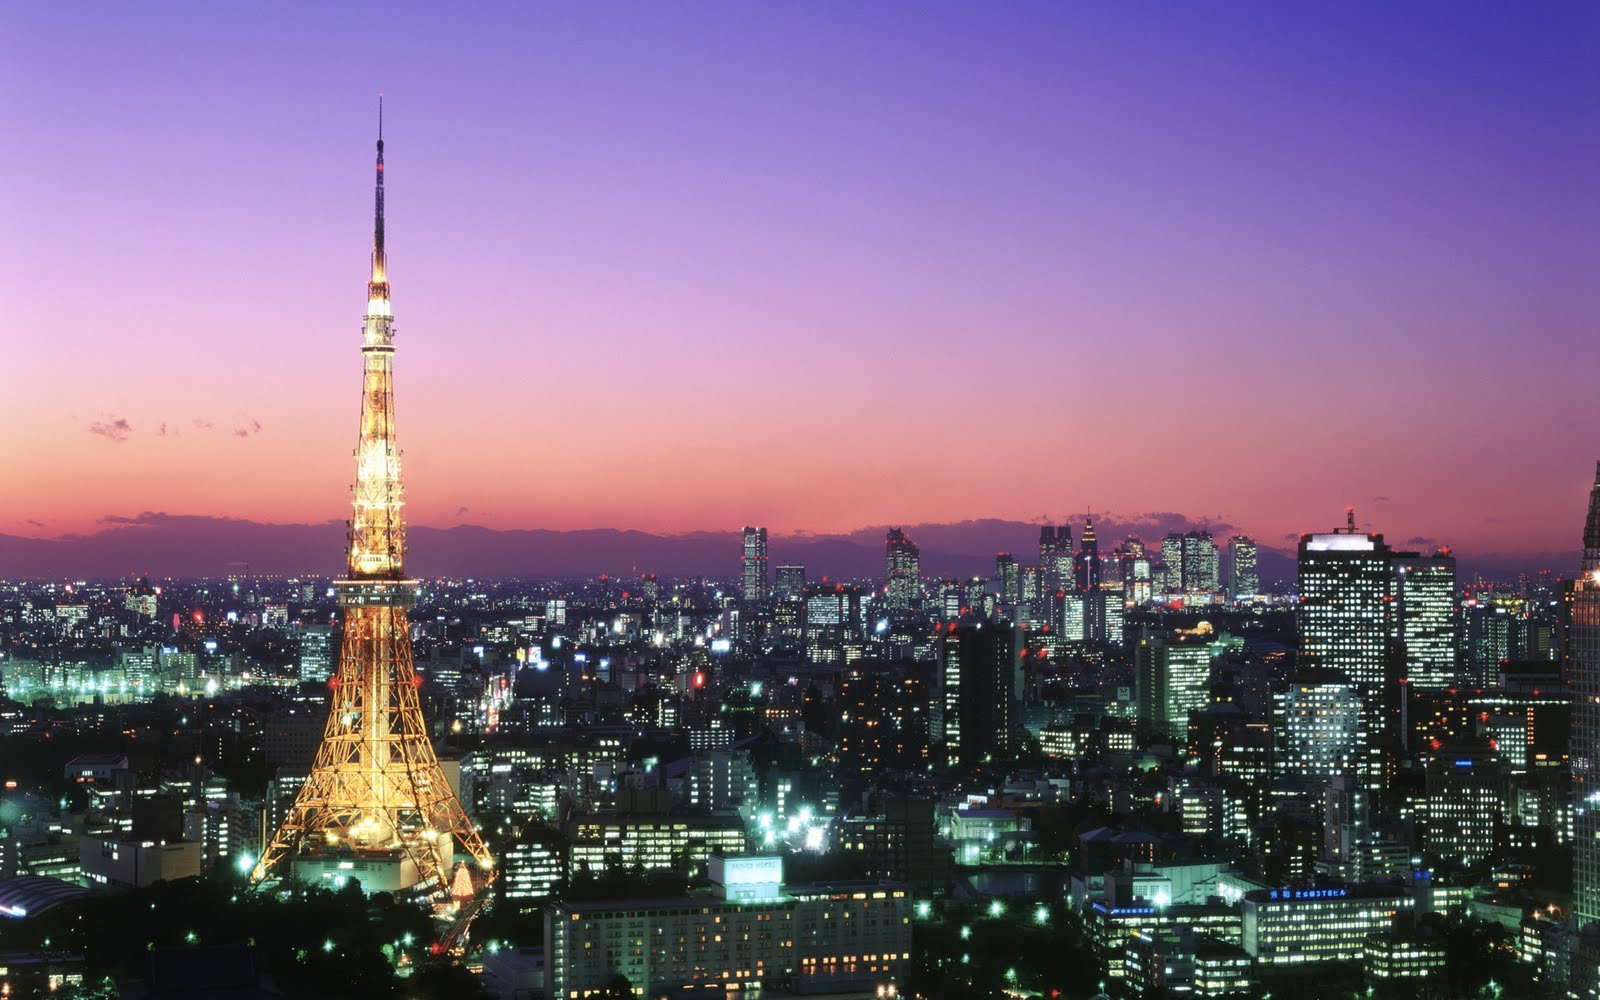 http://2.bp.blogspot.com/-giXPflOJRqQ/ThlLYahSXgI/AAAAAAAAK8I/O-ZS-xzIGhI/s1600/Windows-7-Wallpaper-Japan-04.jpg